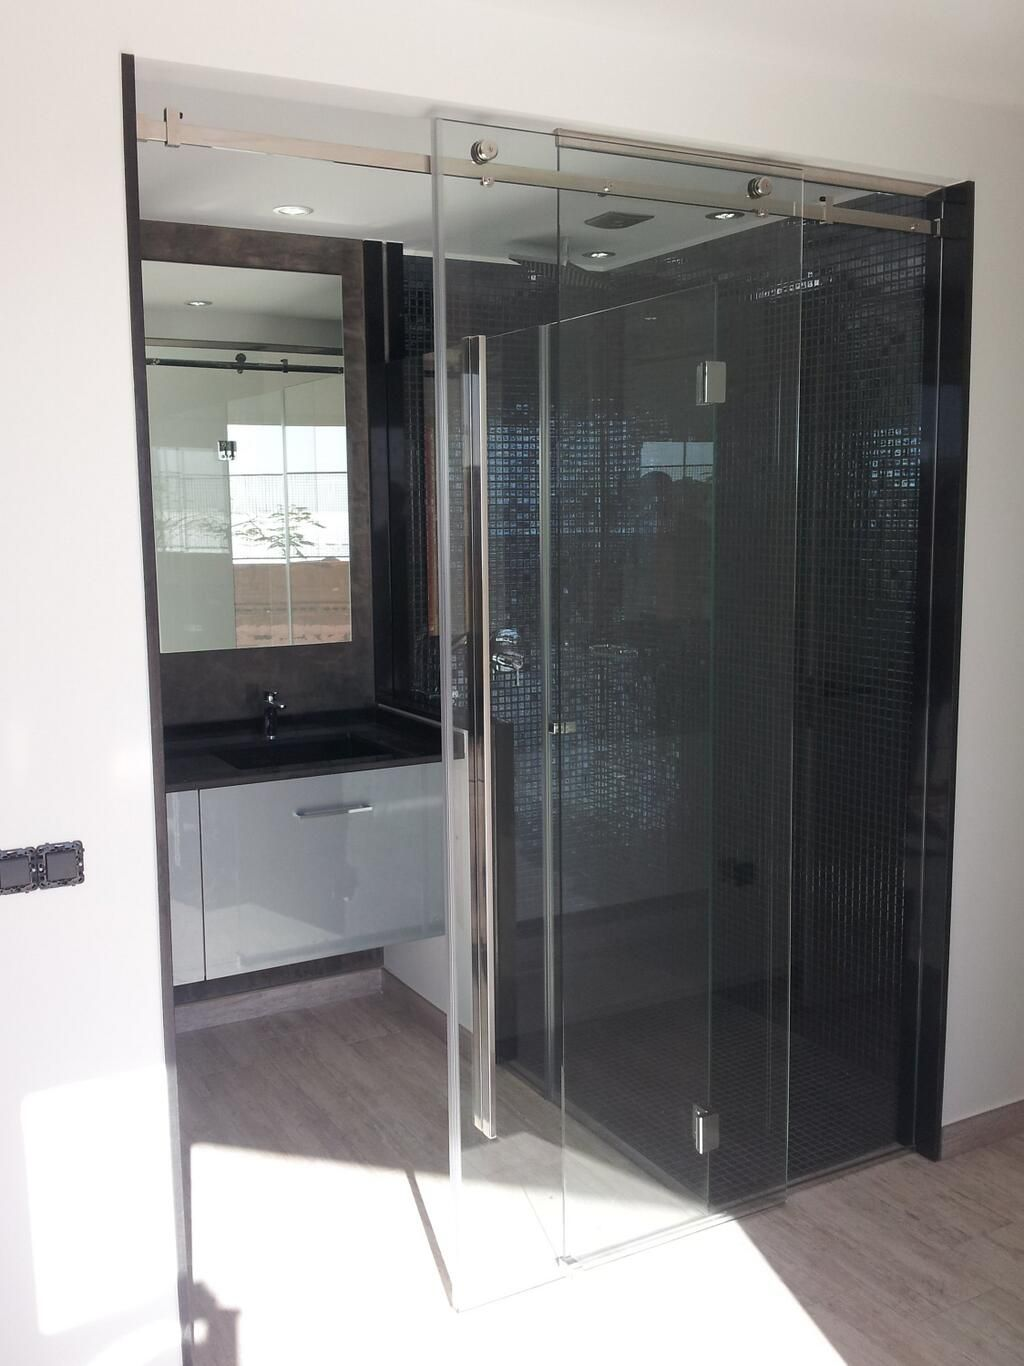 Cristal Chafiras On Locker Storage Room Divider Home Decor